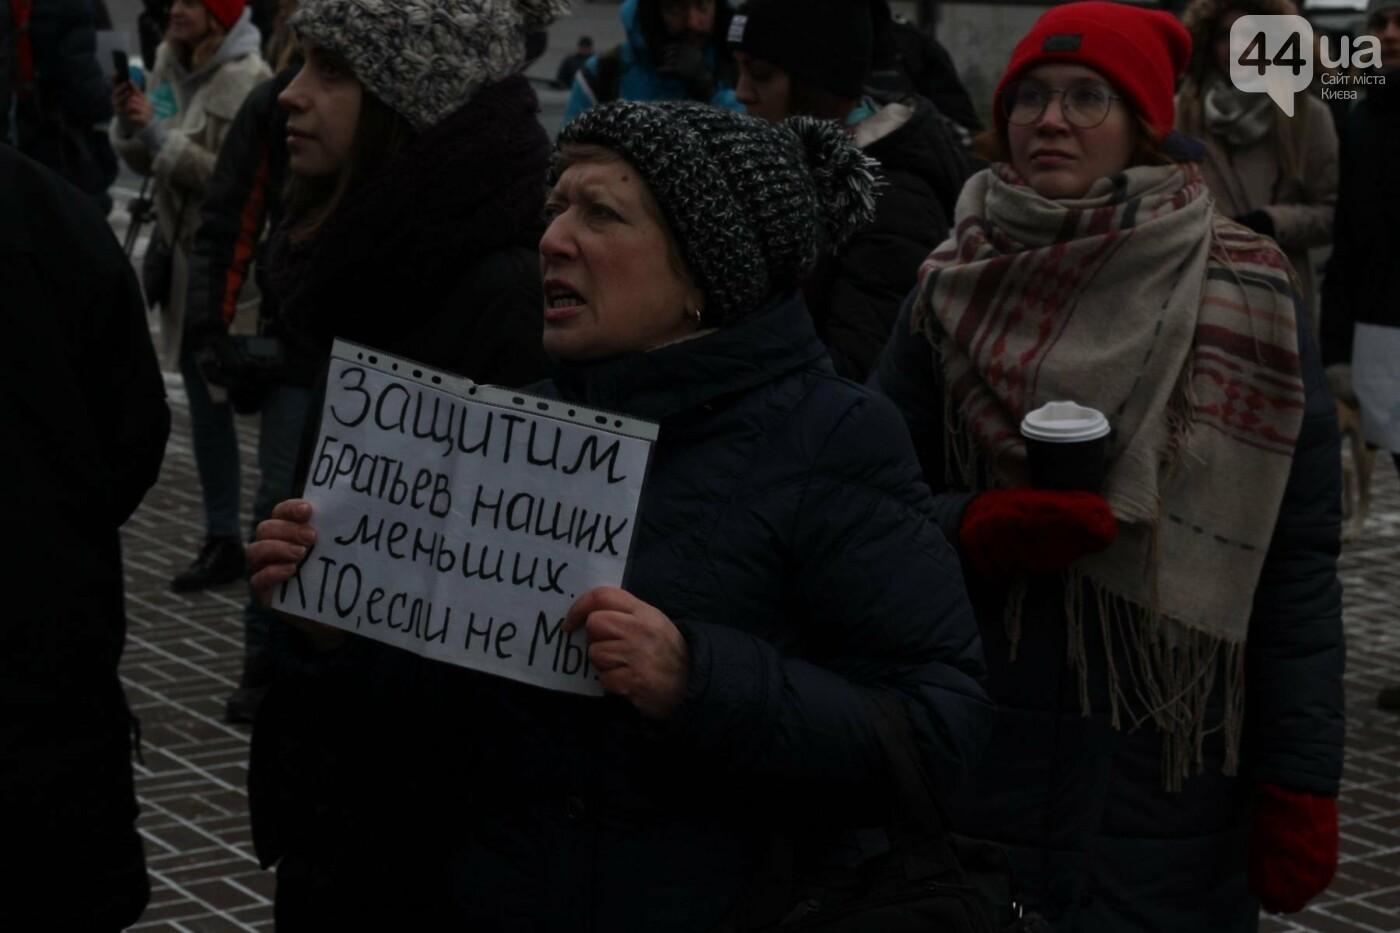 Цирк без животных: как в Киеве прошла акция протеста, фото-6